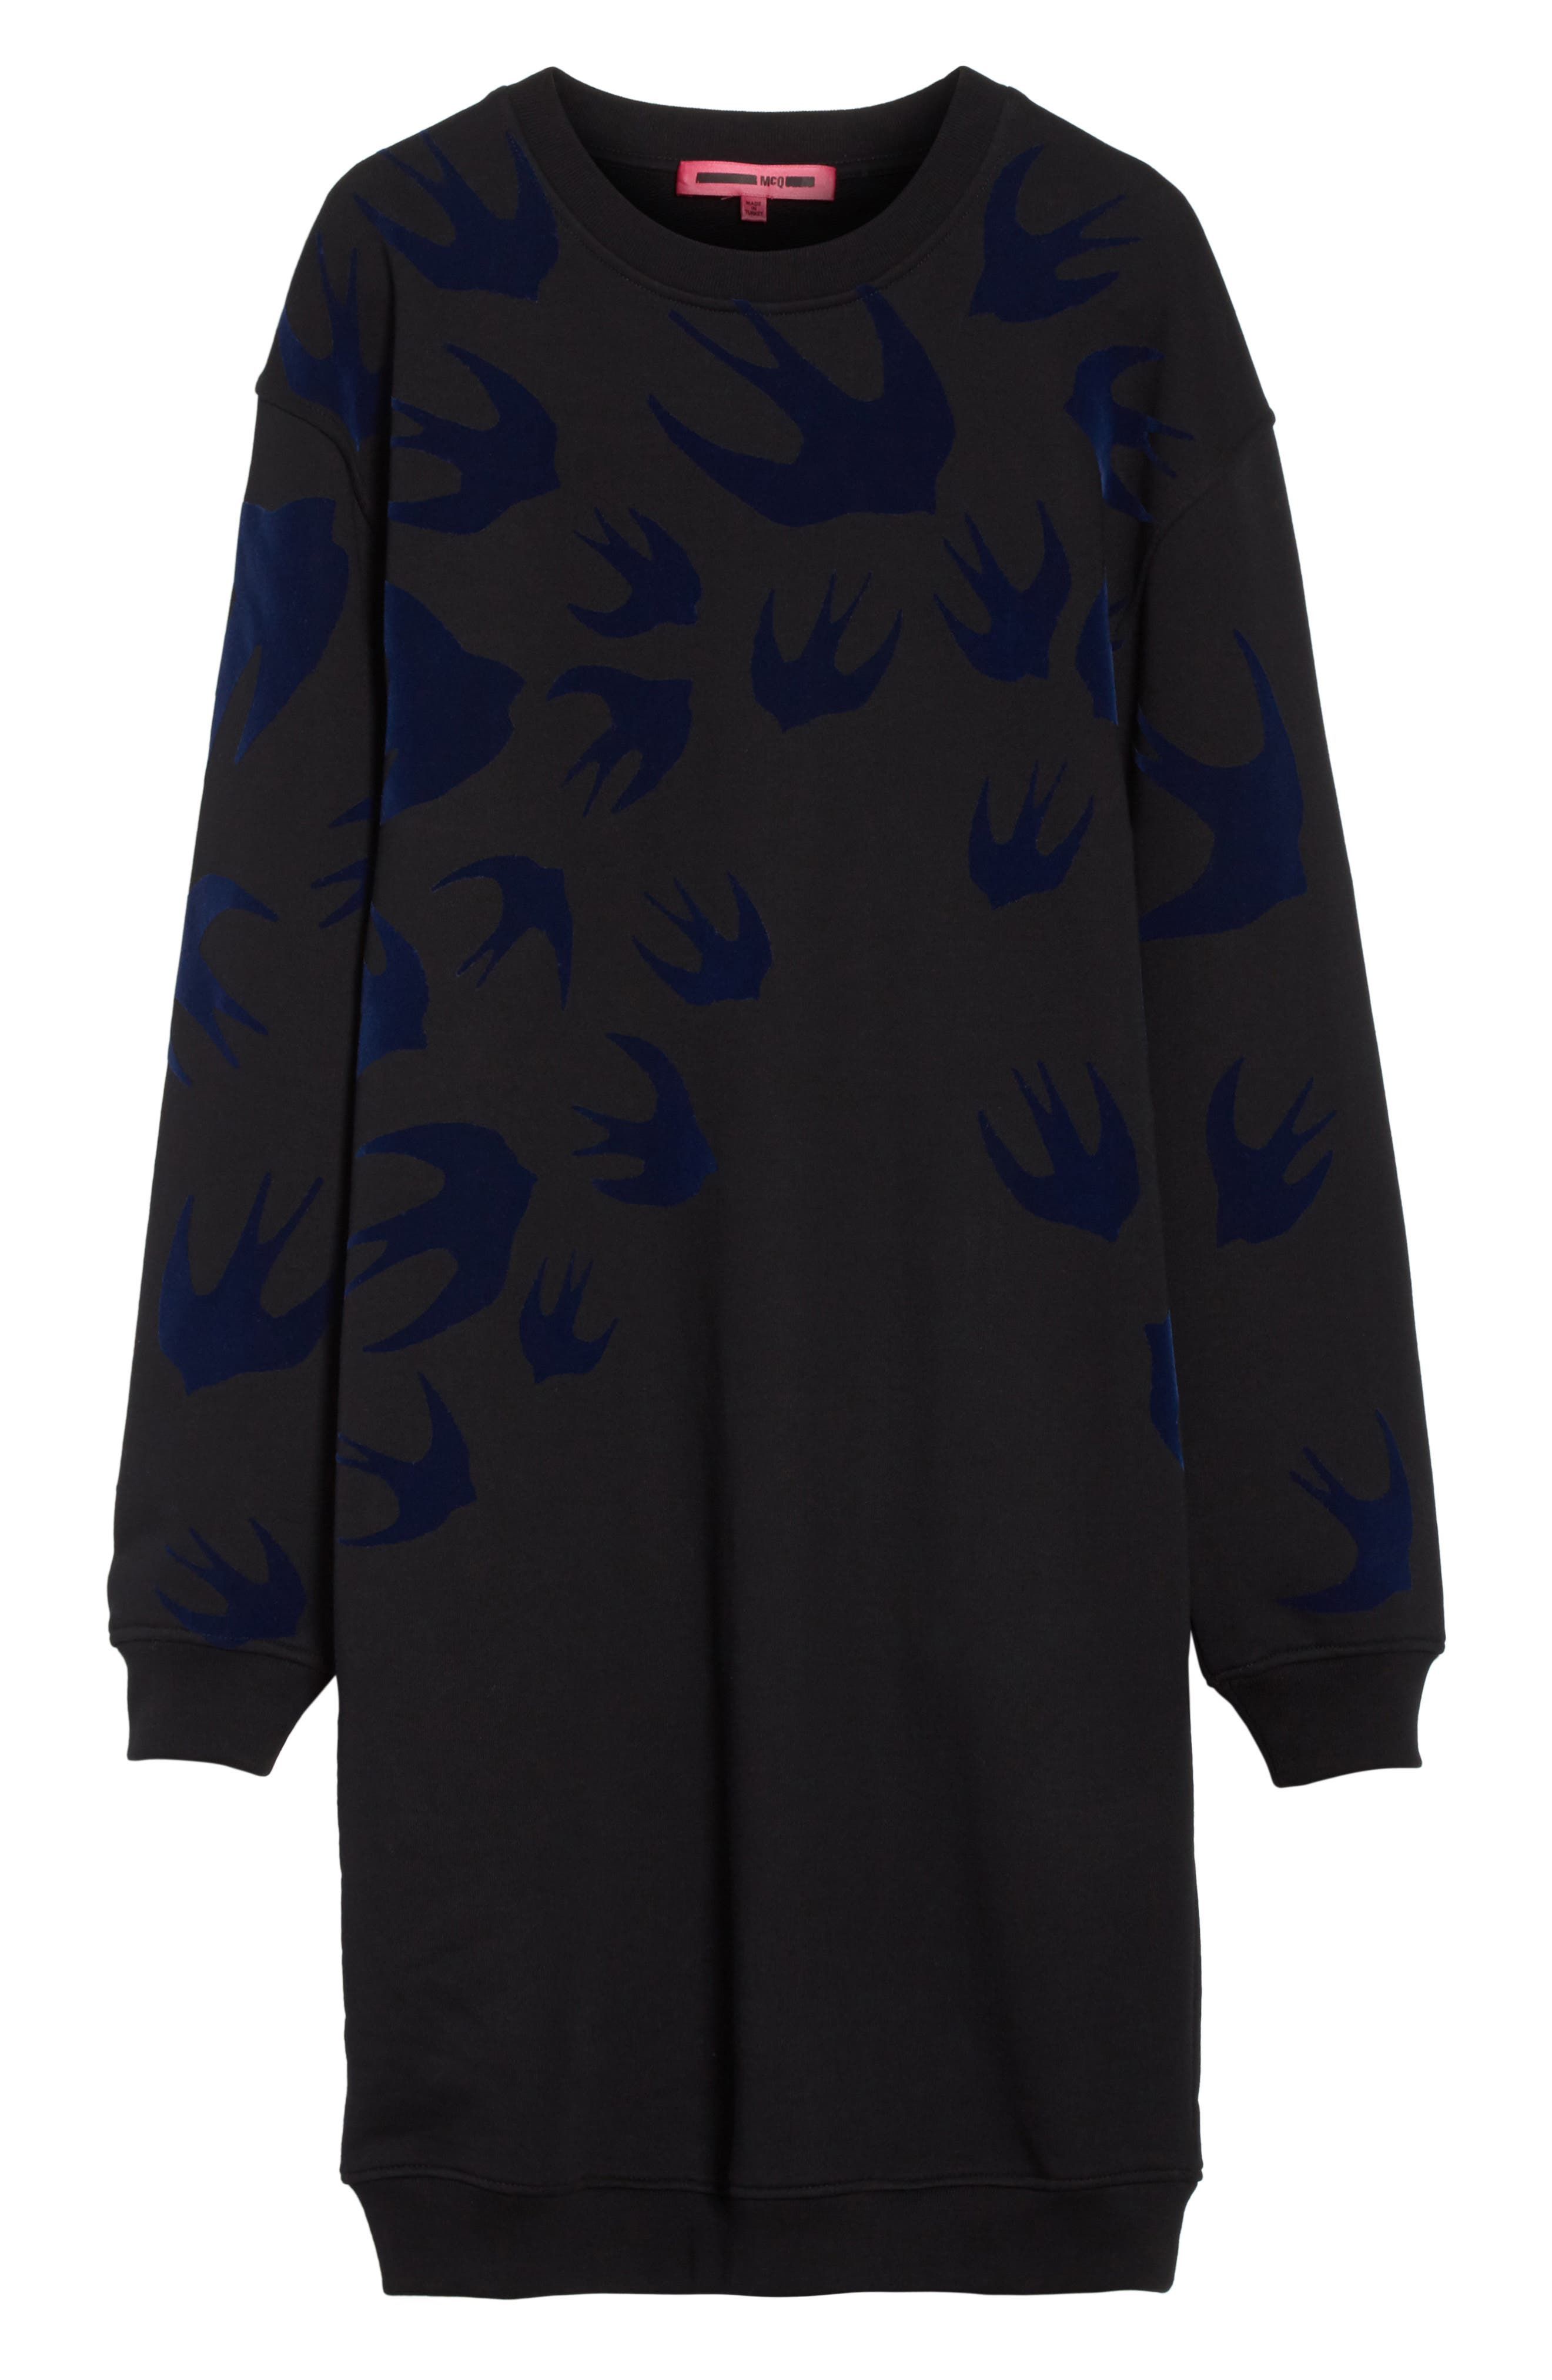 Swallow Classic Sweatshirt Dress,                             Alternate thumbnail 6, color,                             011